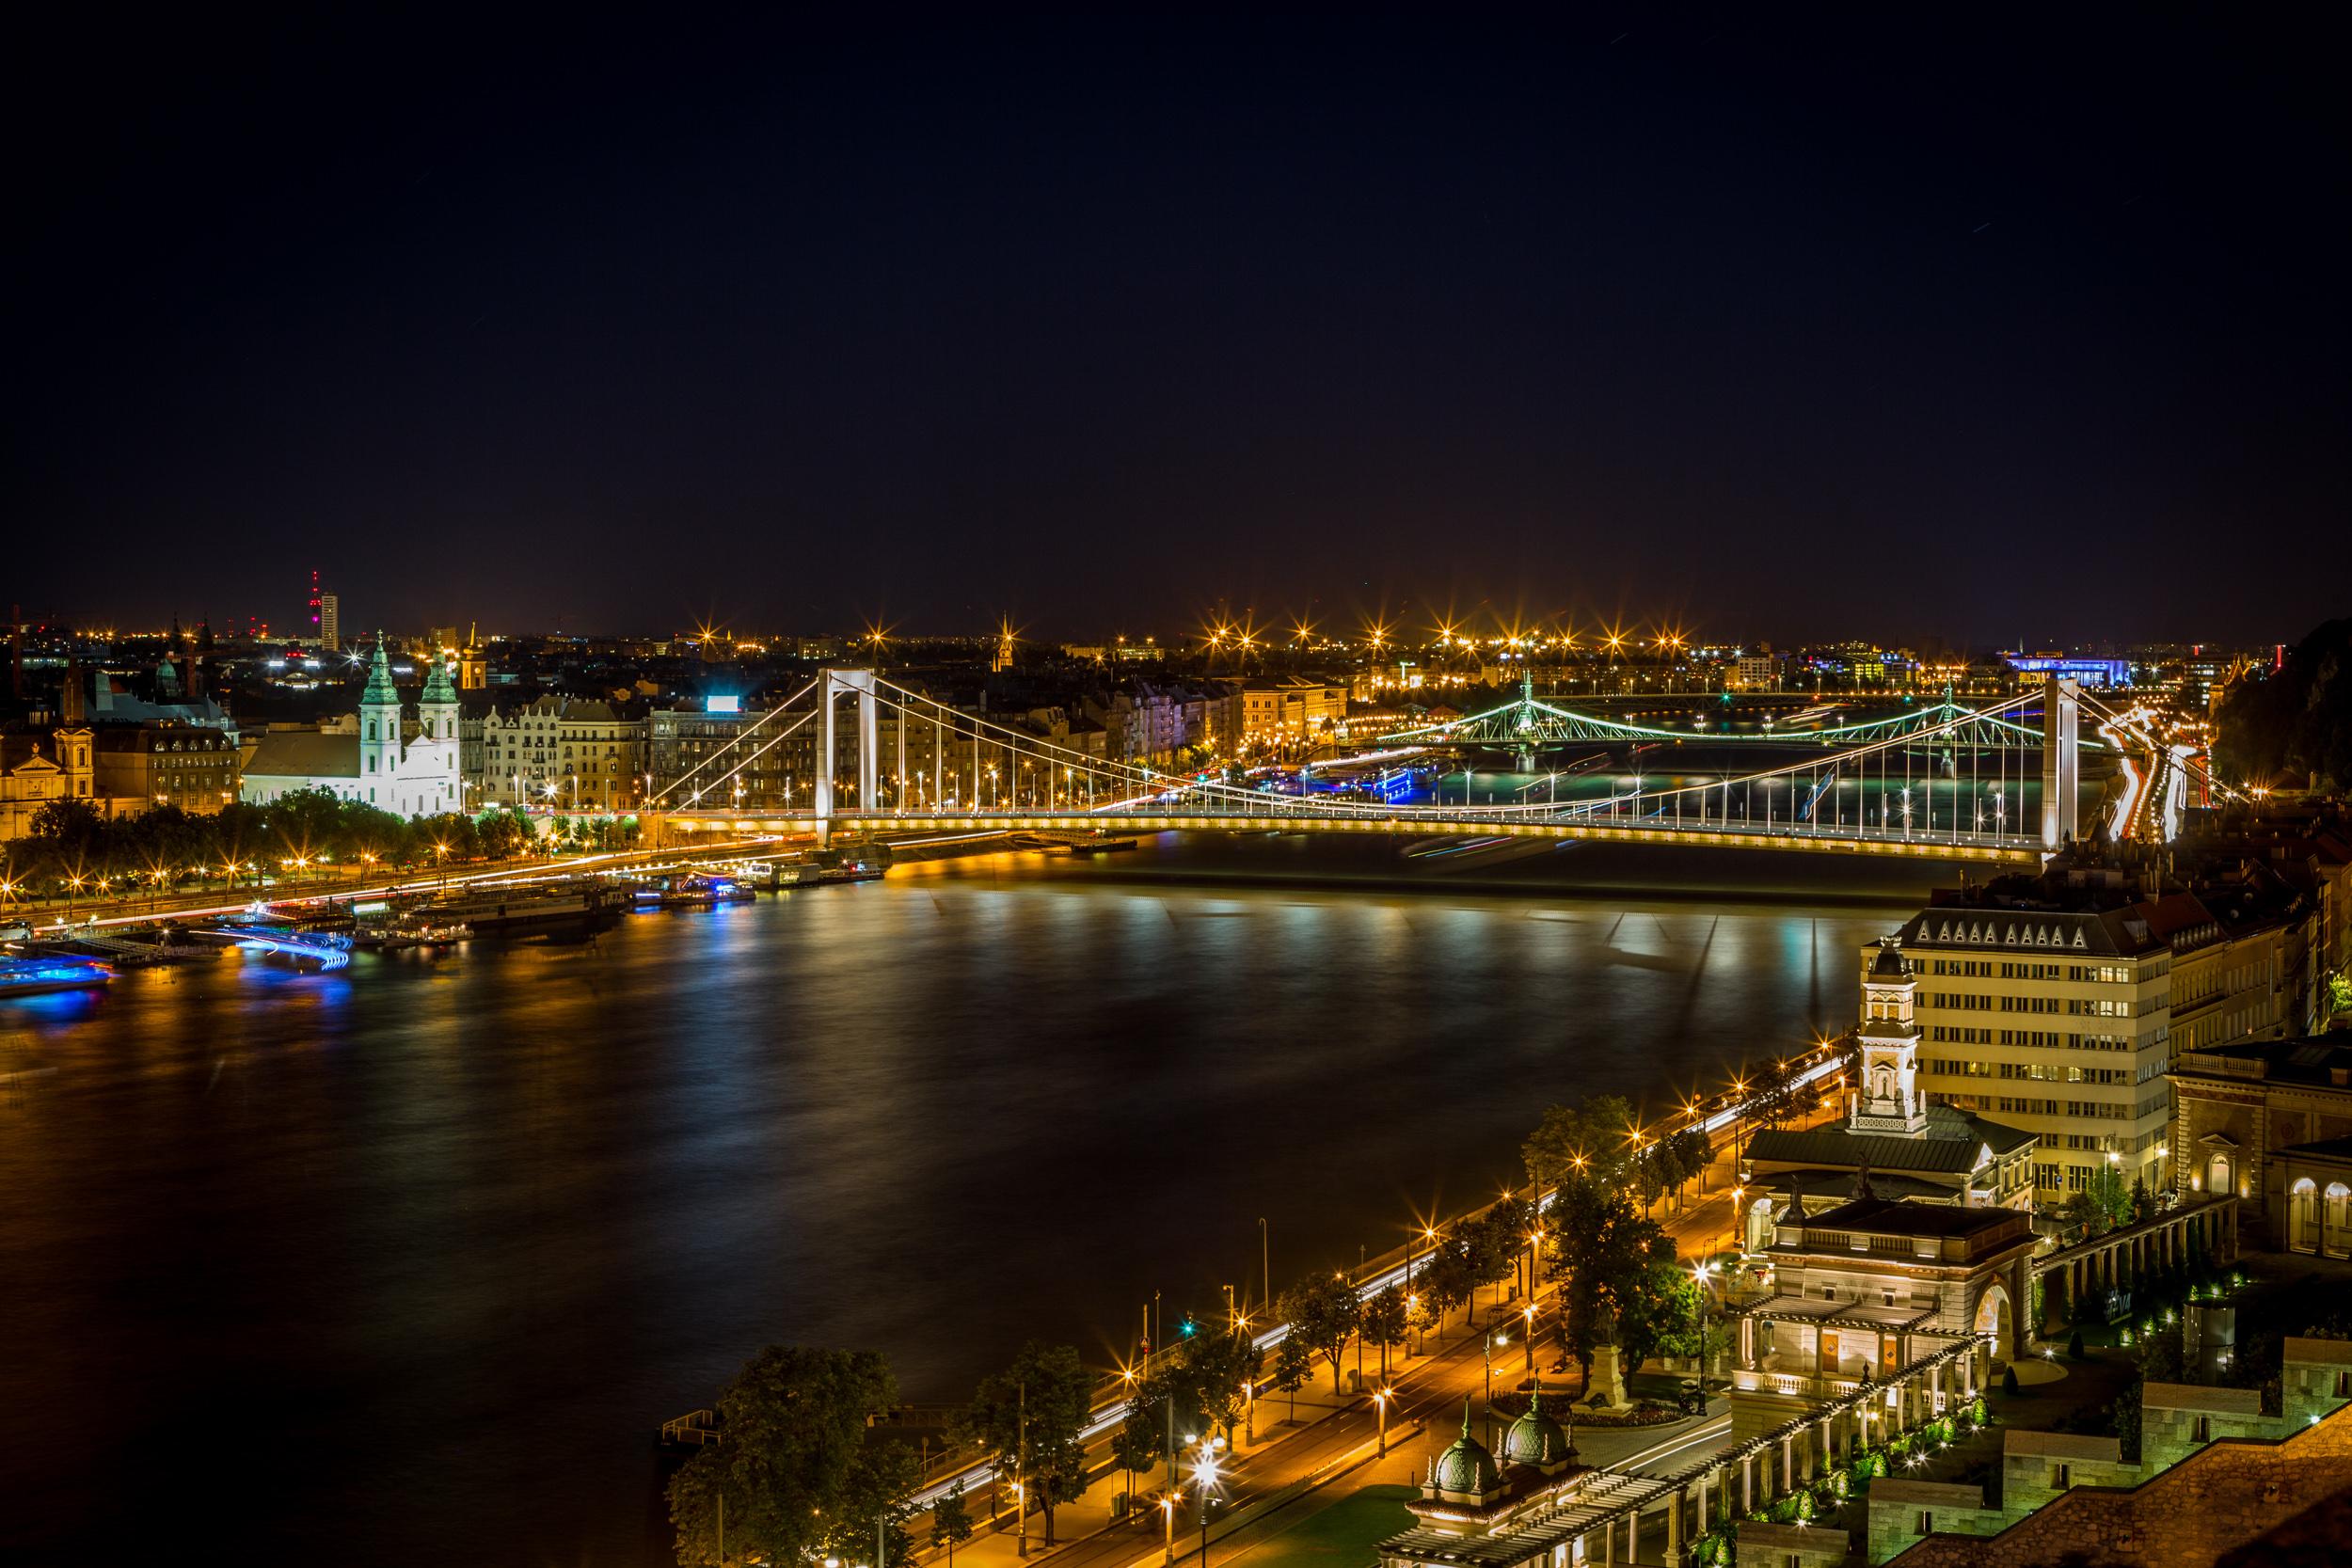 Elizabeth Bridge from Buda Castle, ISO100, 55mm, f/16, 72sec